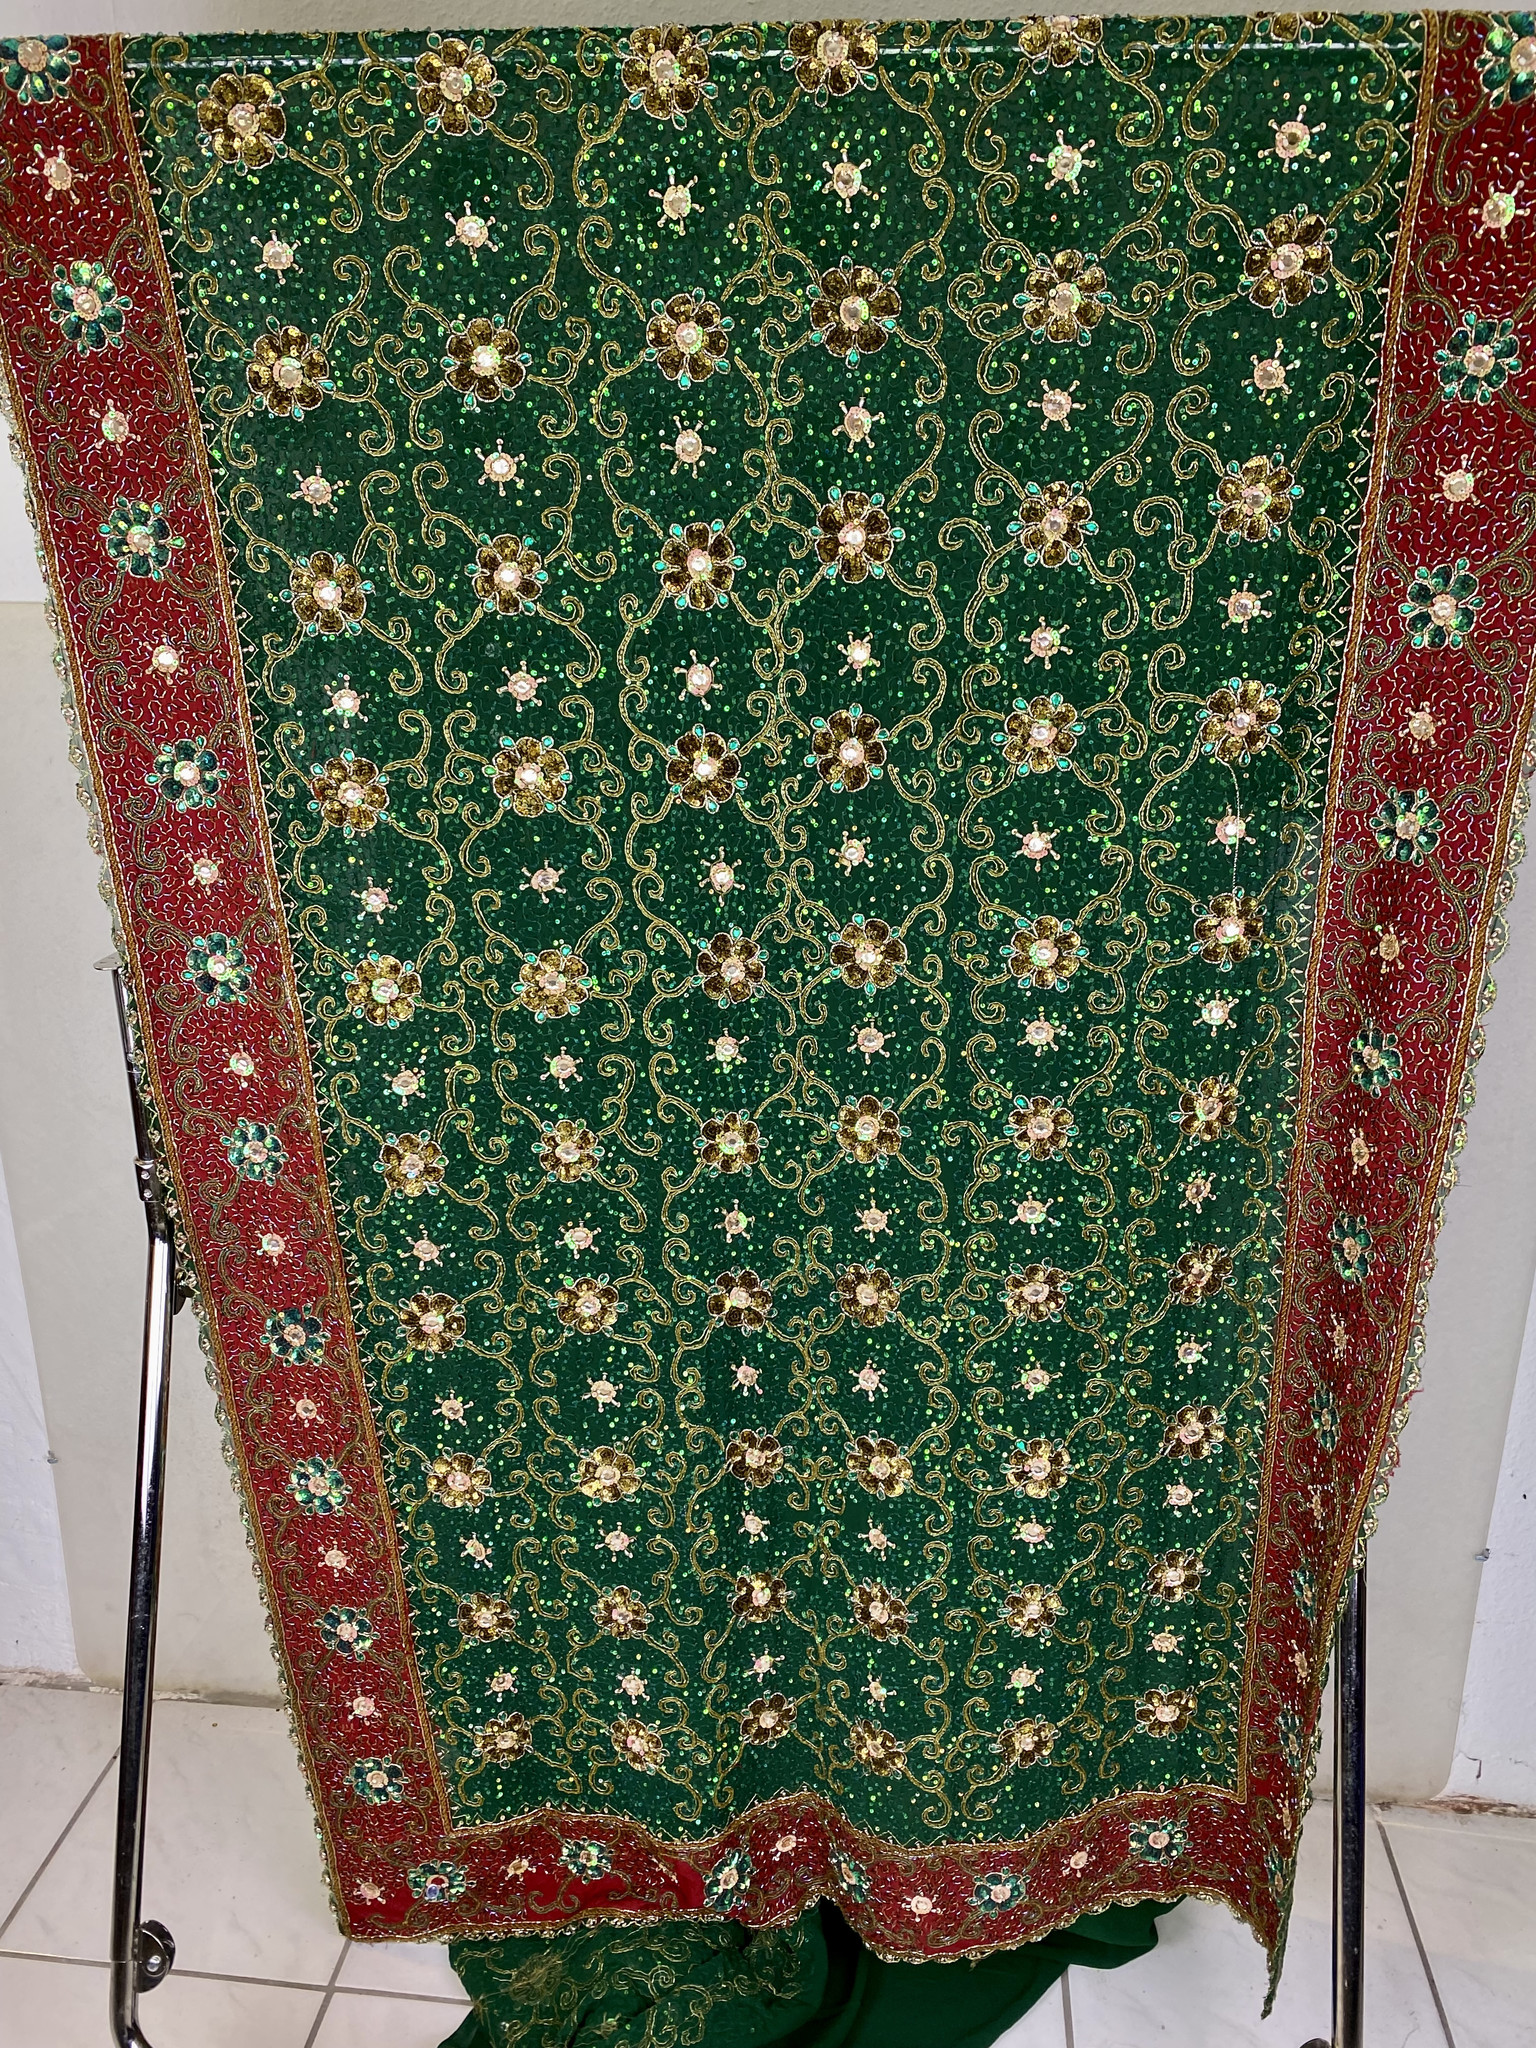 Schwerer Pailletten Sari, reich bestickt